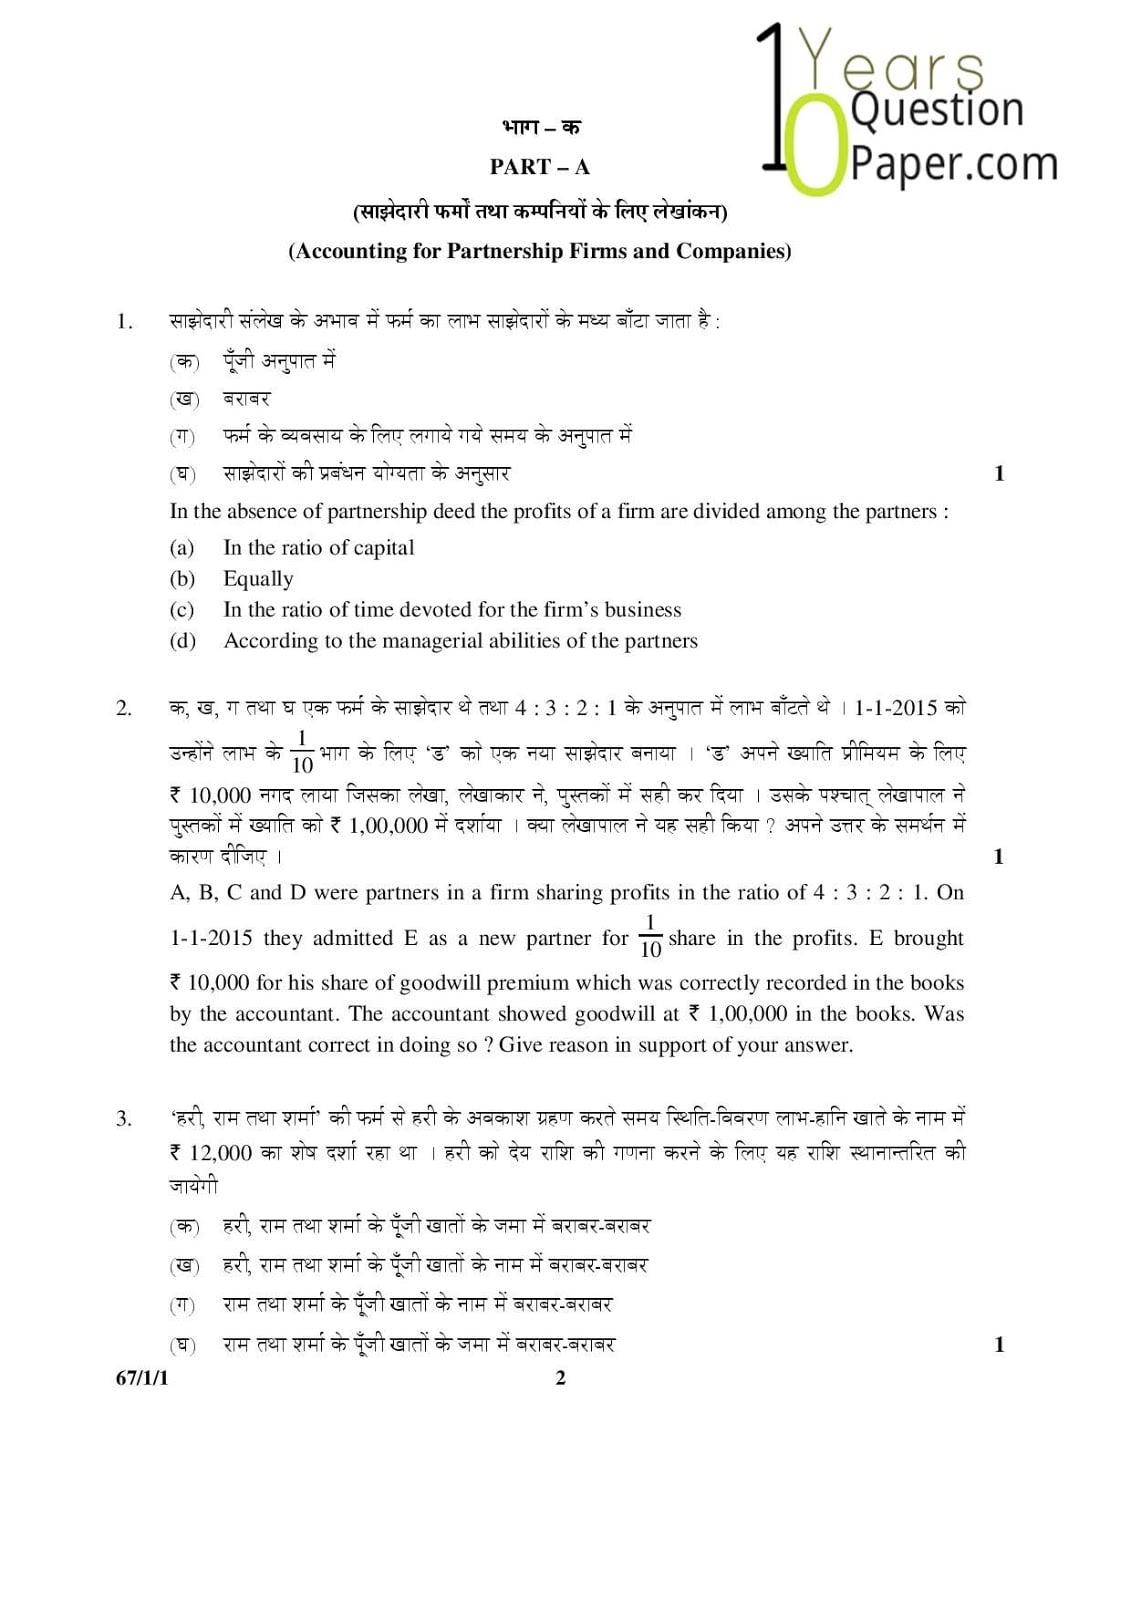 CBSE Class 12 Accountancy 2015 Question Paper